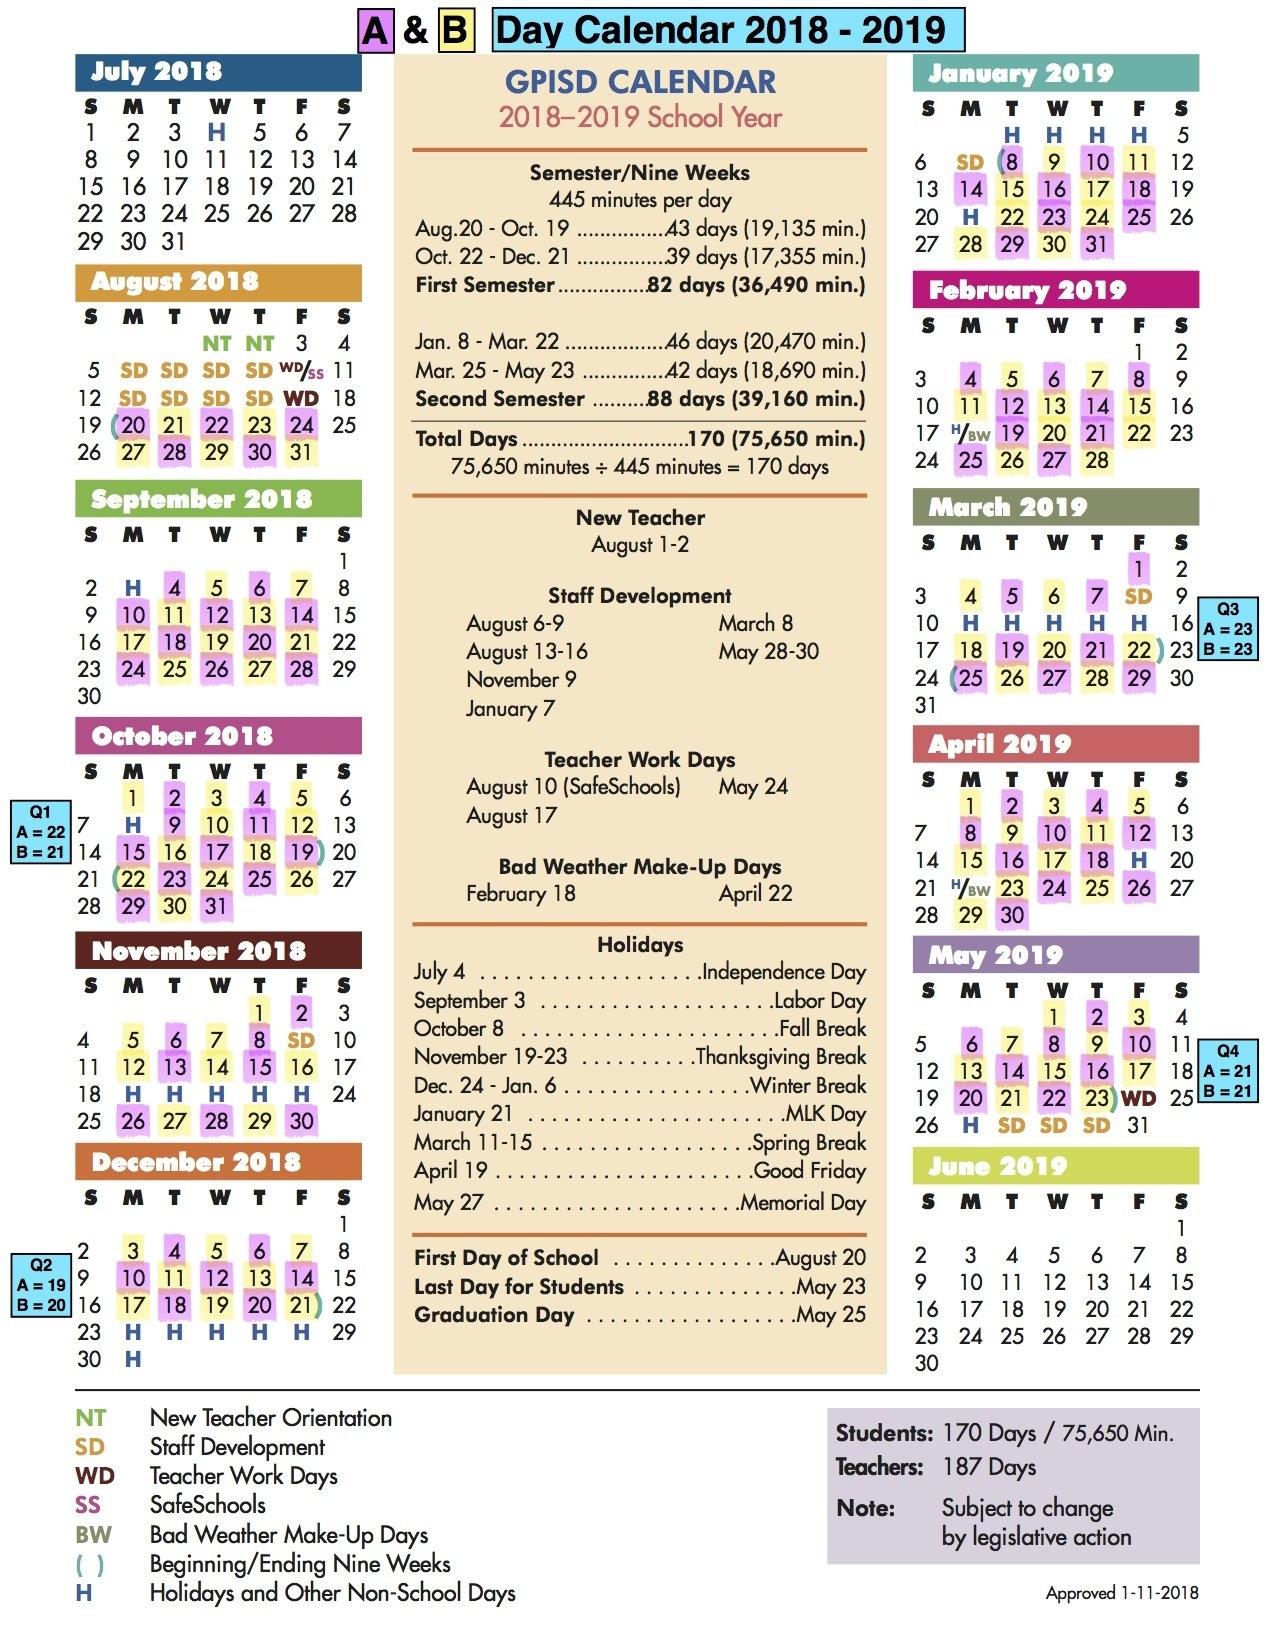 A/b Calendar / A/b Day Calendar Stephen F Austin Calendar 2019